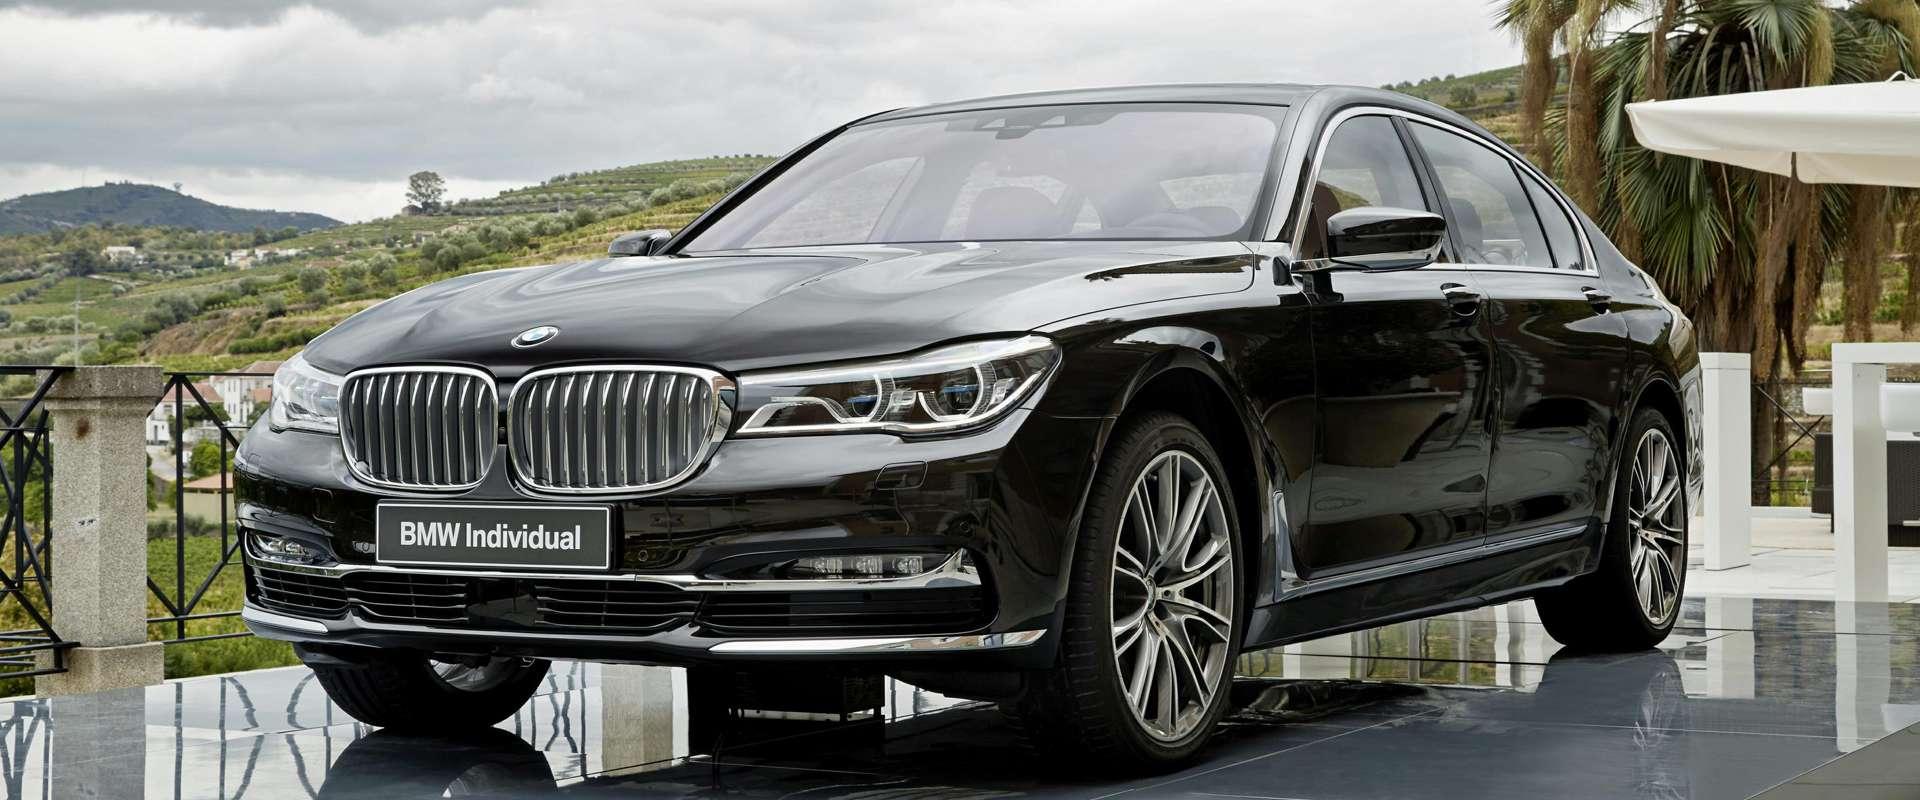 FOTO: Luksuz na kvadrat: BMW 750Li Individual i 740Le